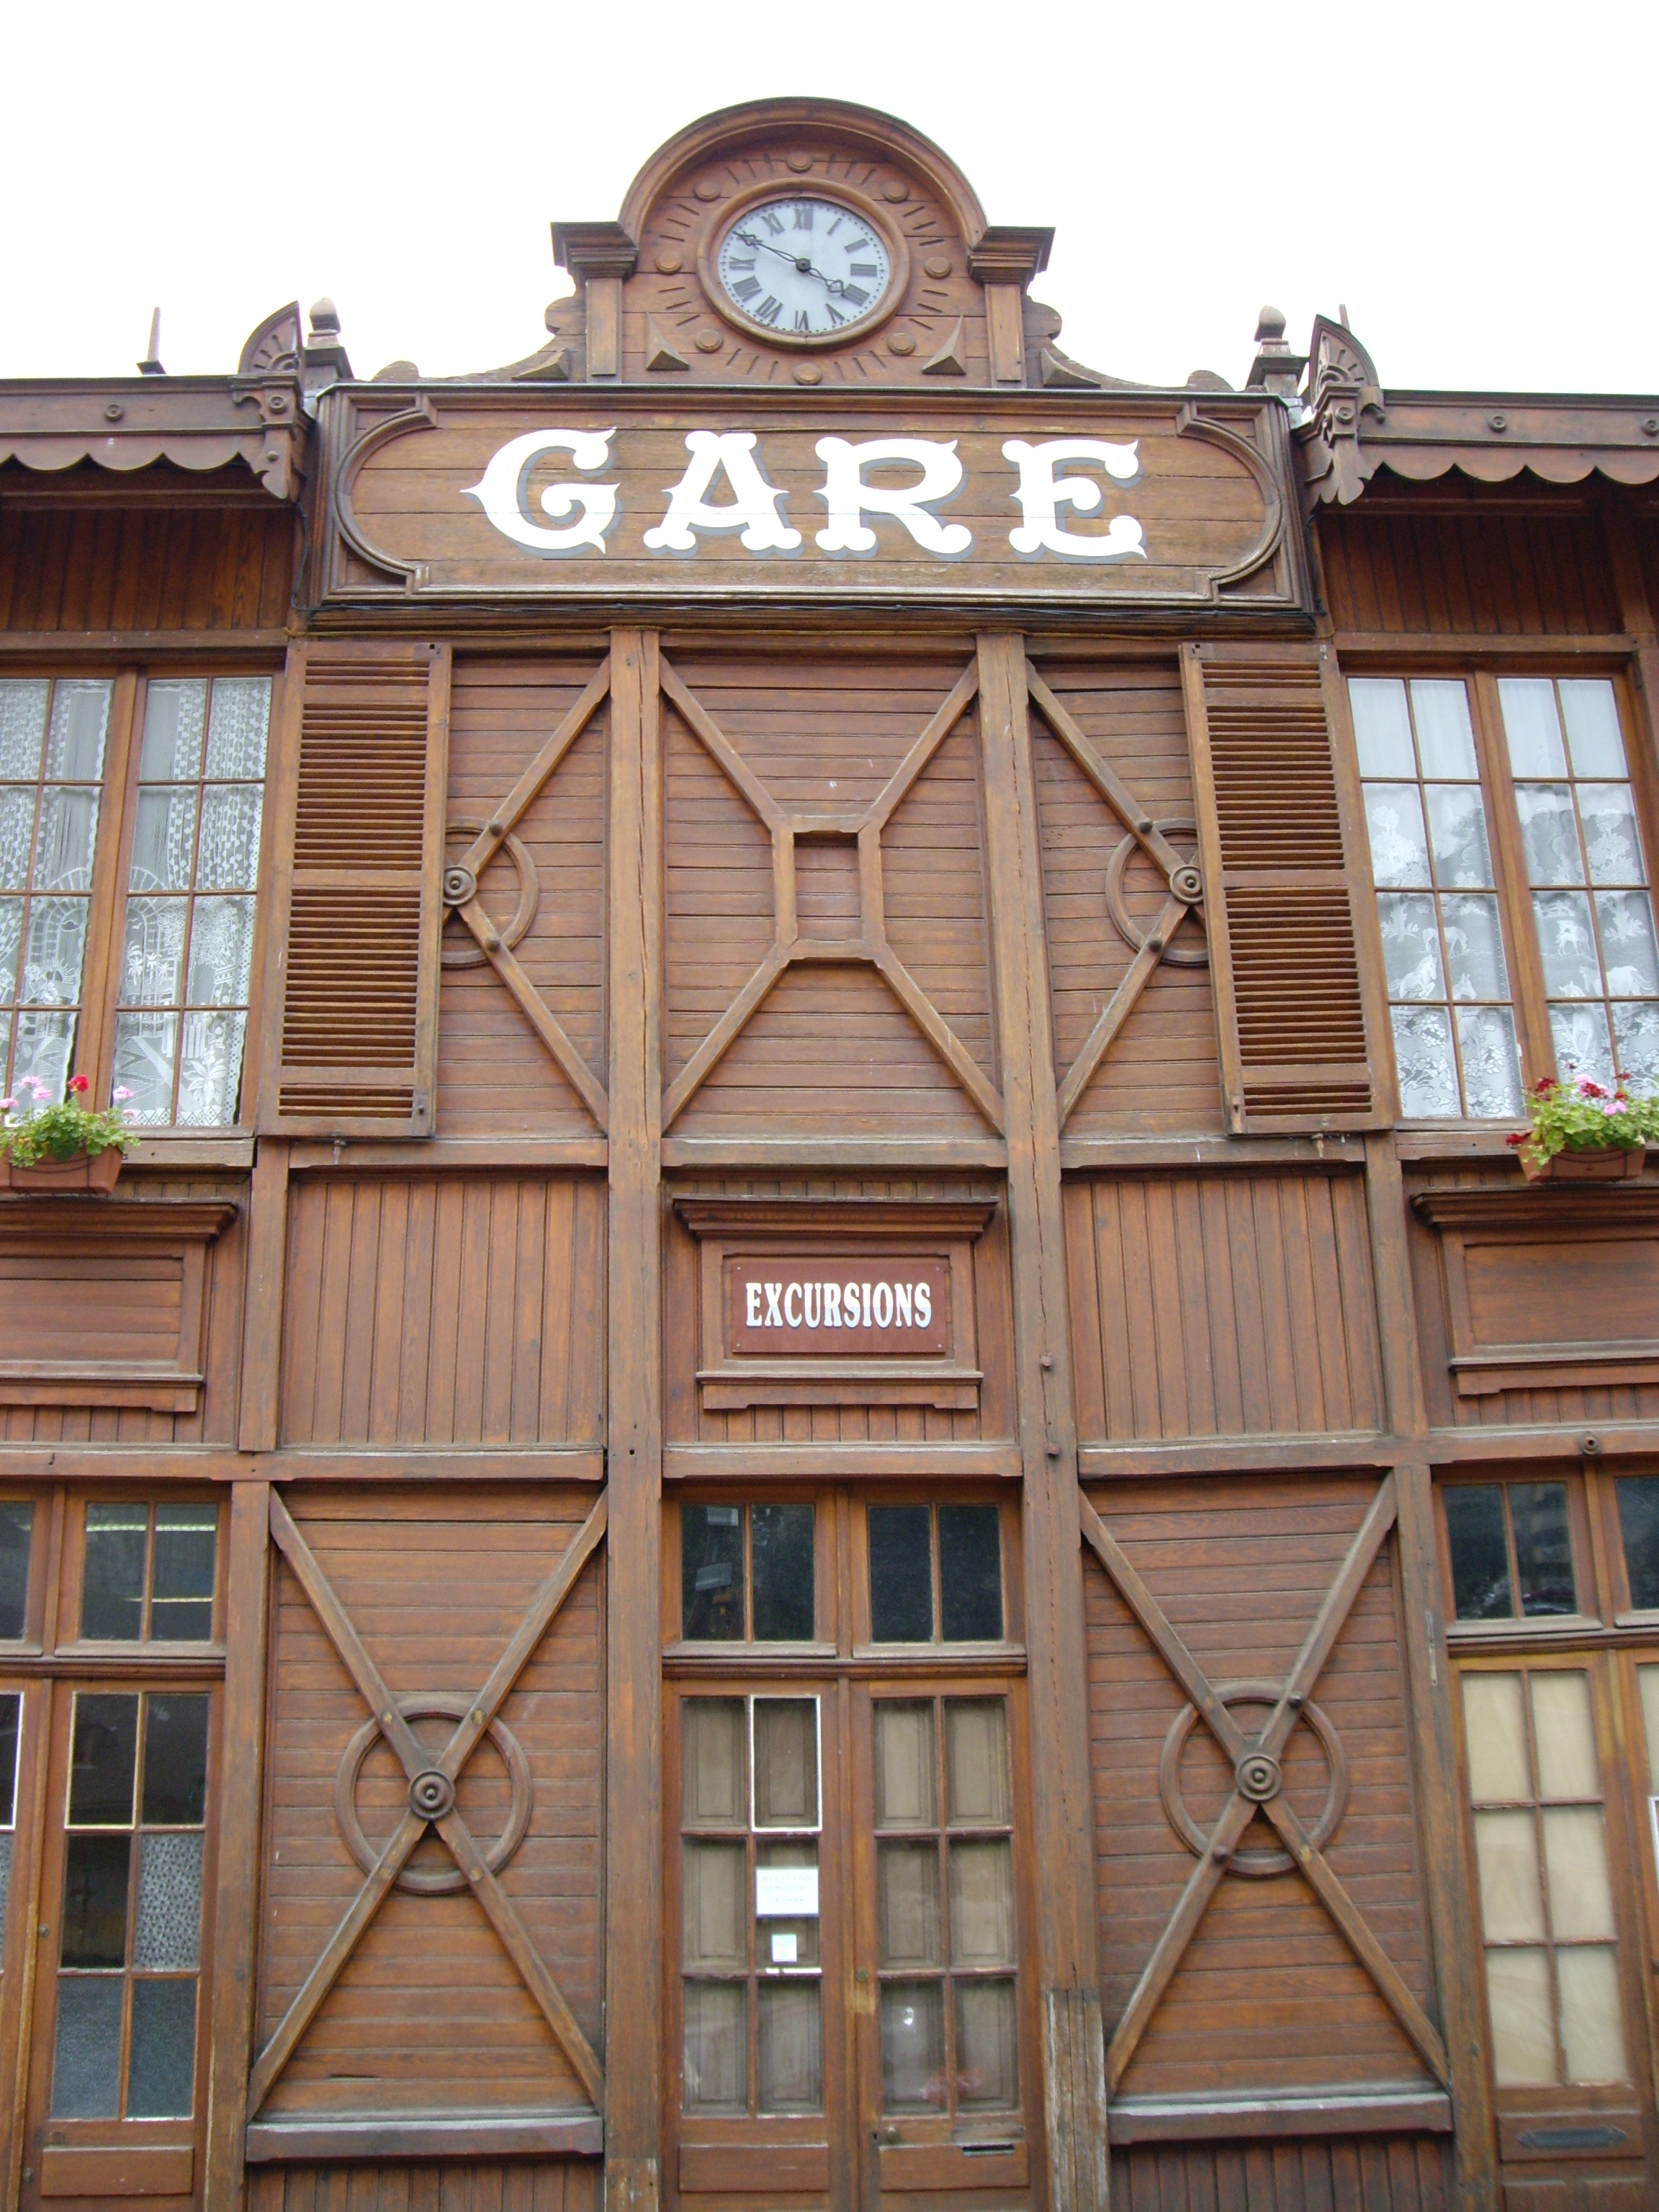 http://upload.wikimedia.org/wikipedia/commons/5/54/Ancienne_gare_ferroviaire_de_Cauterets.JPG